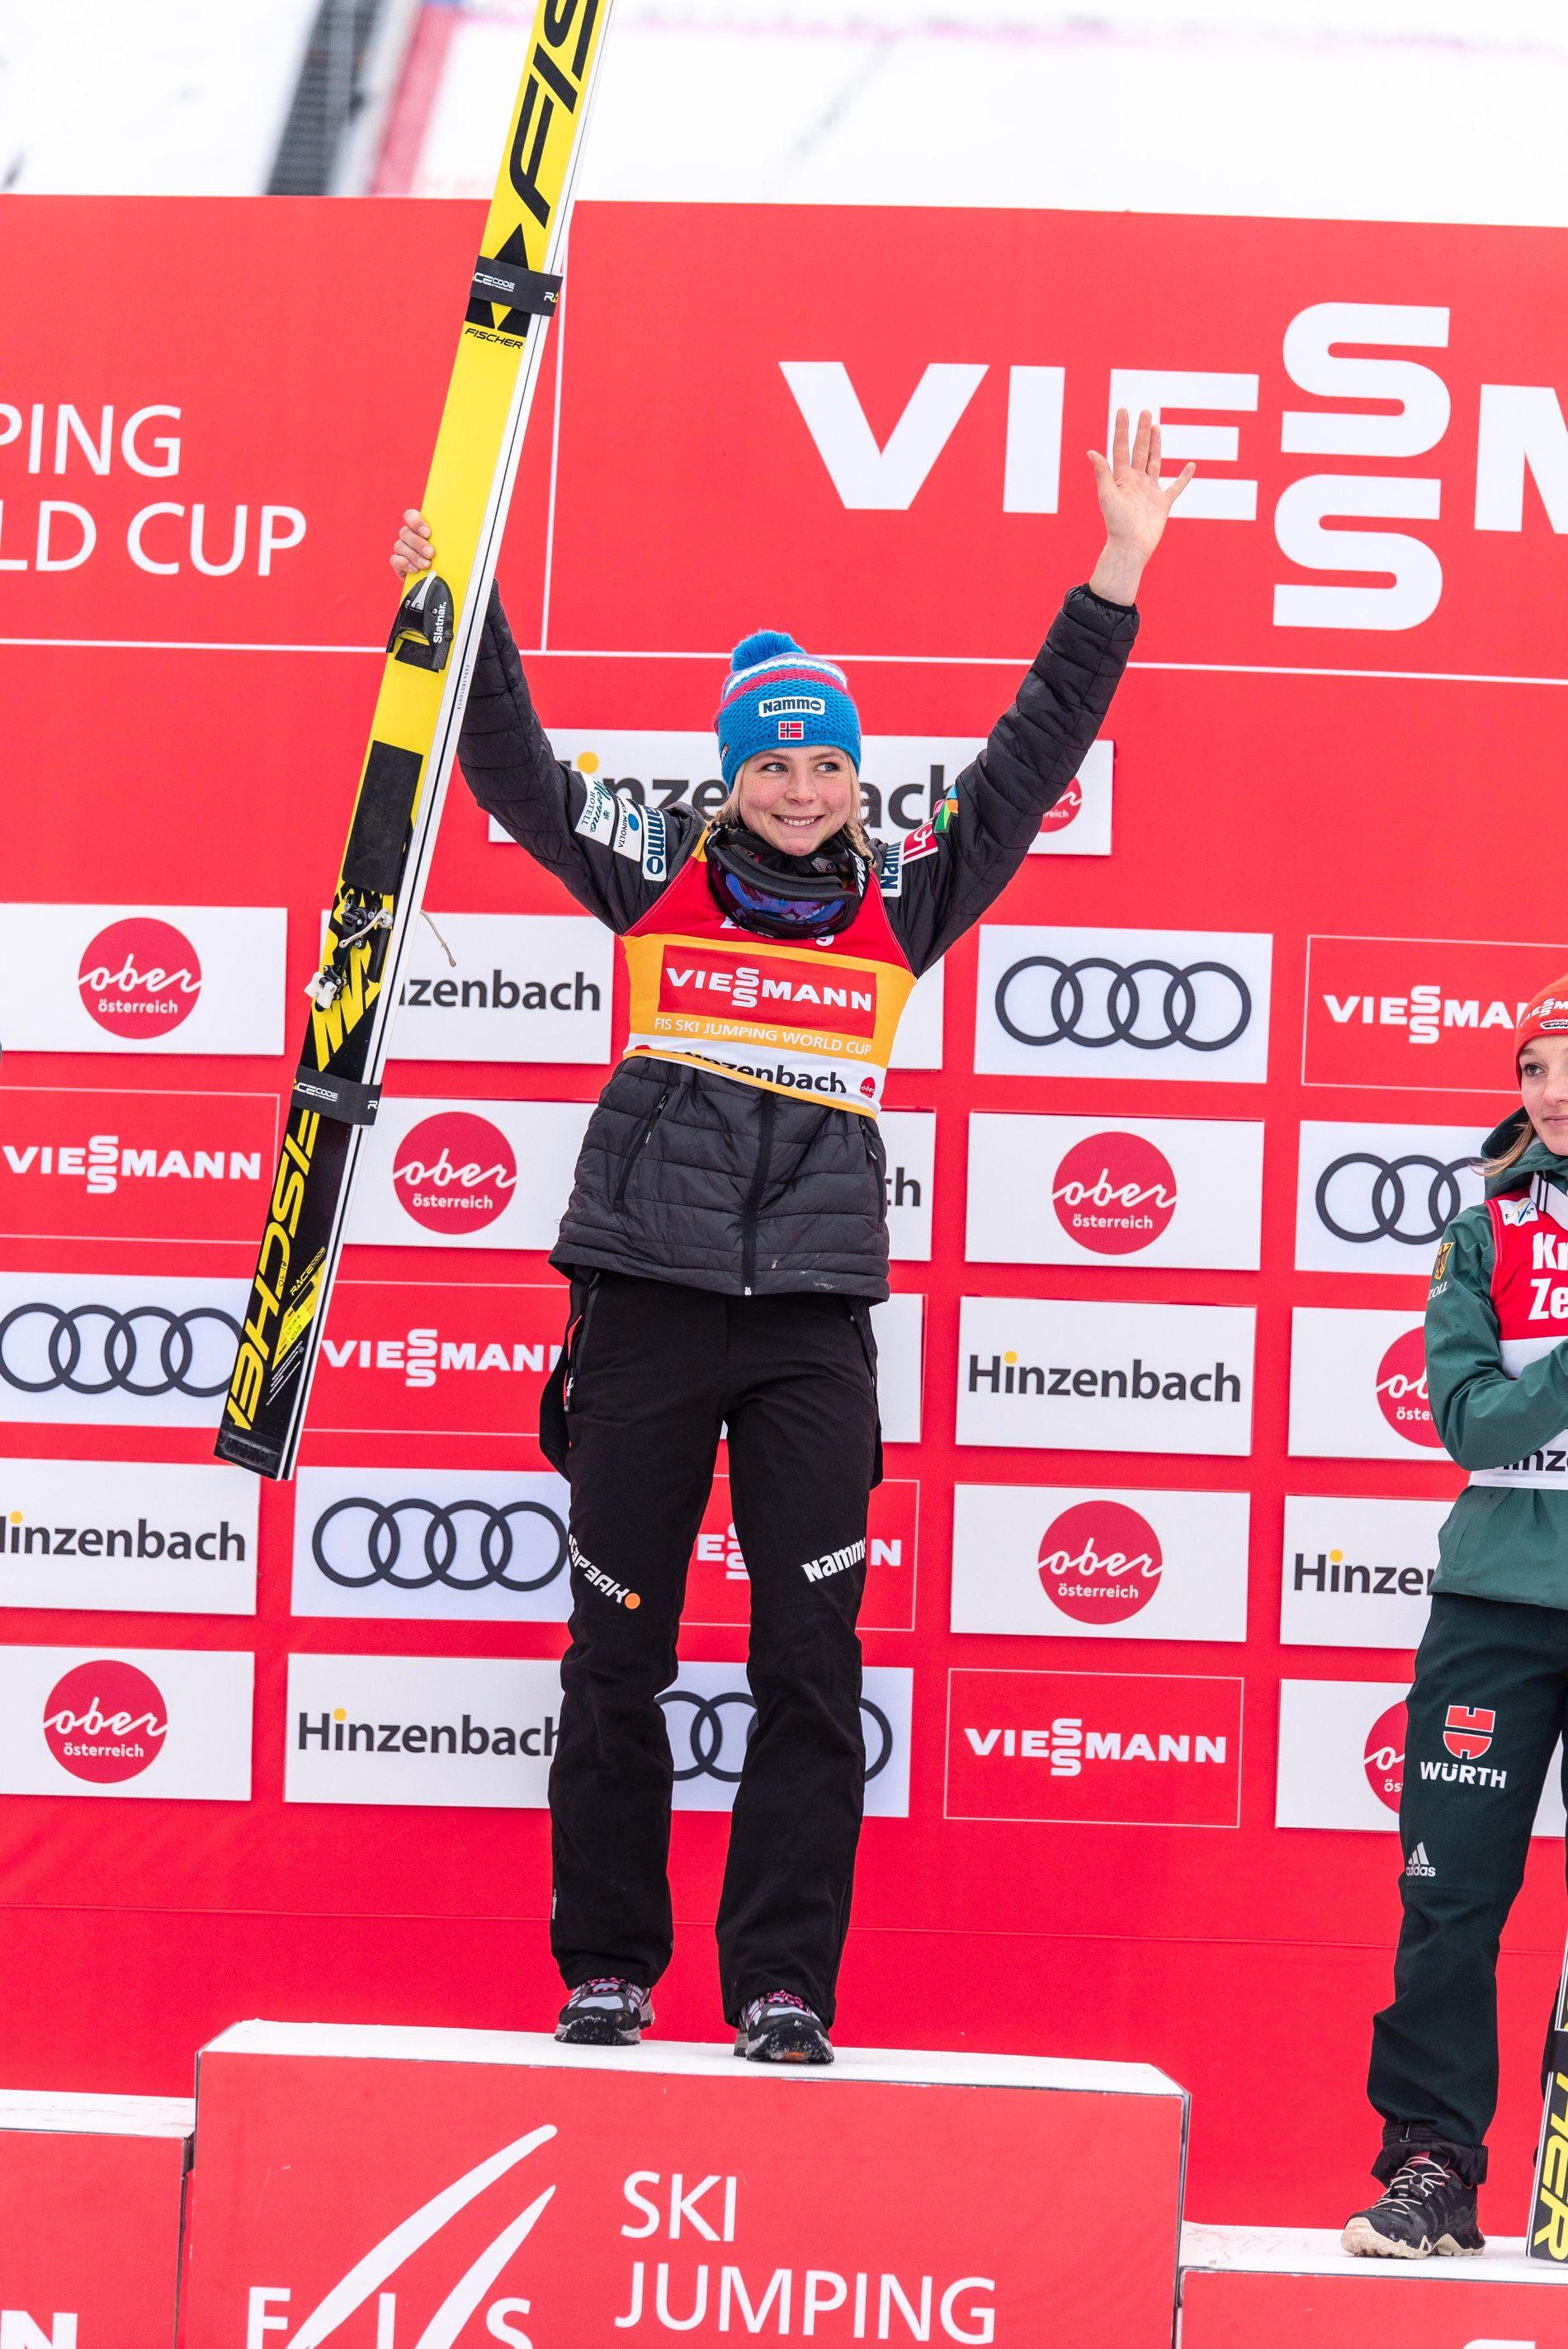 ØVERST: Maren Lundby jubler for seieren i østerrikske Hinzenbach.